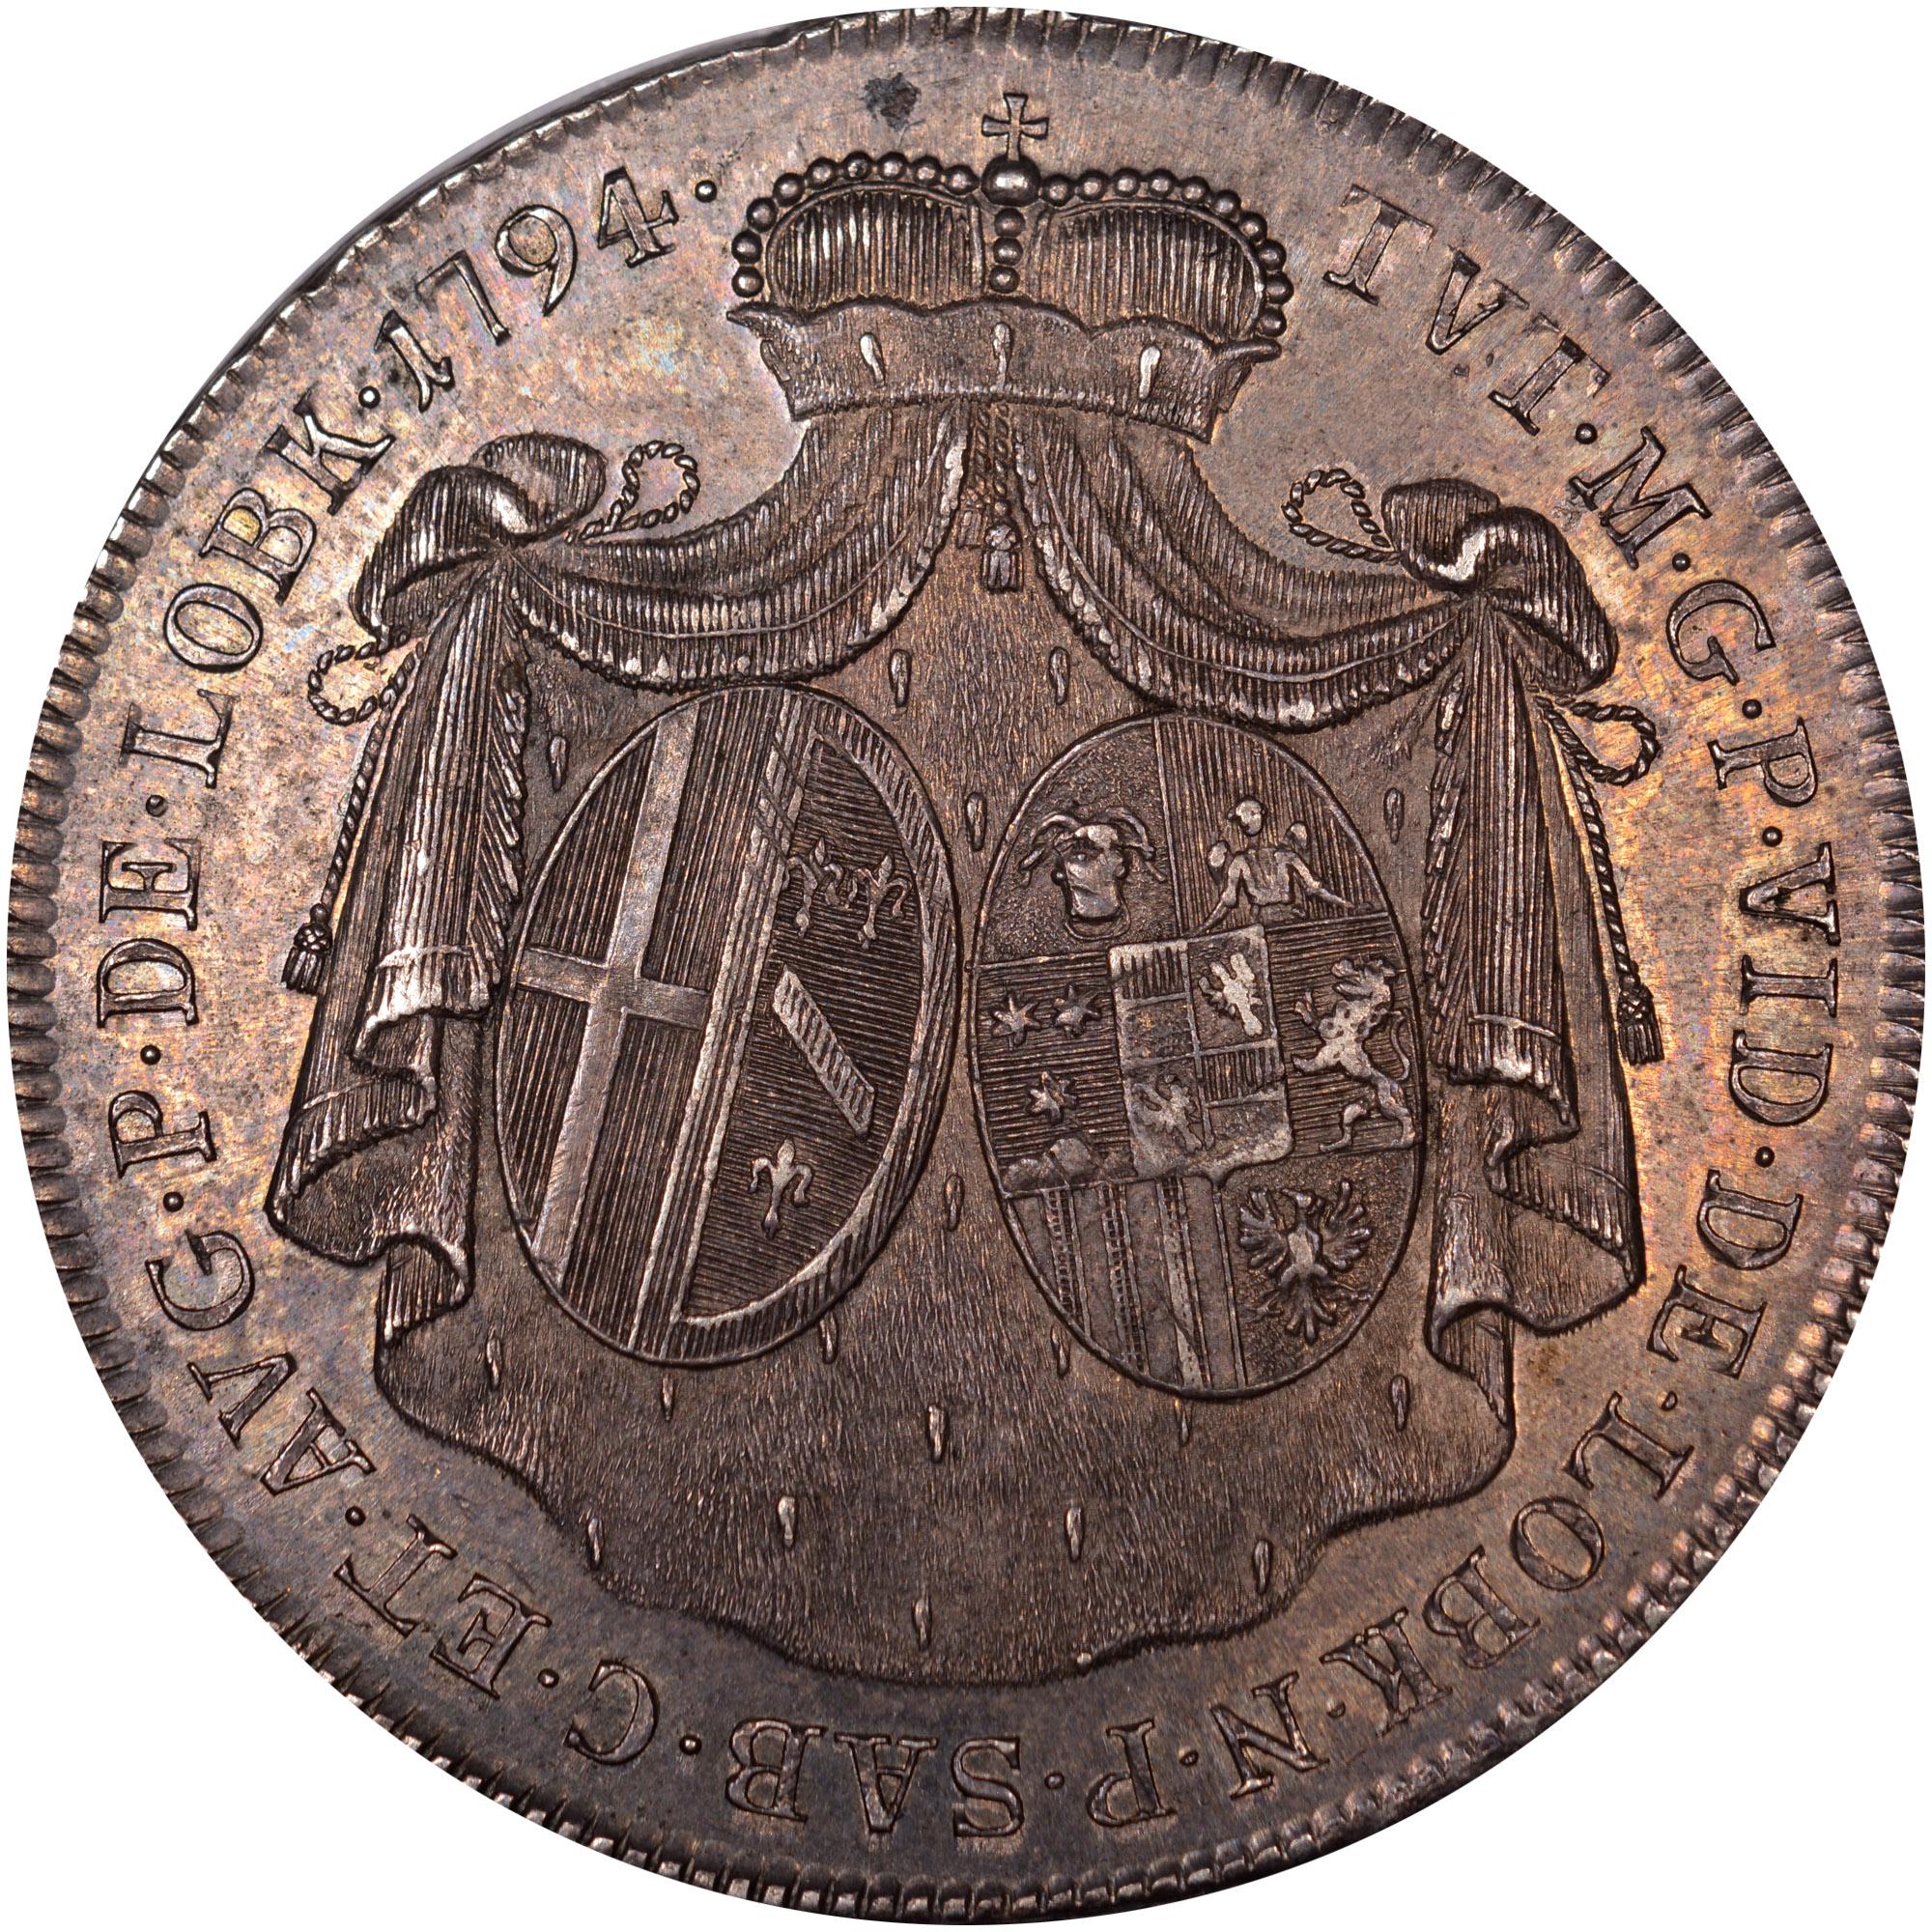 1794 Bohemia LOBKOWITZ-STERNSTEIN 20 Kreuzer reverse